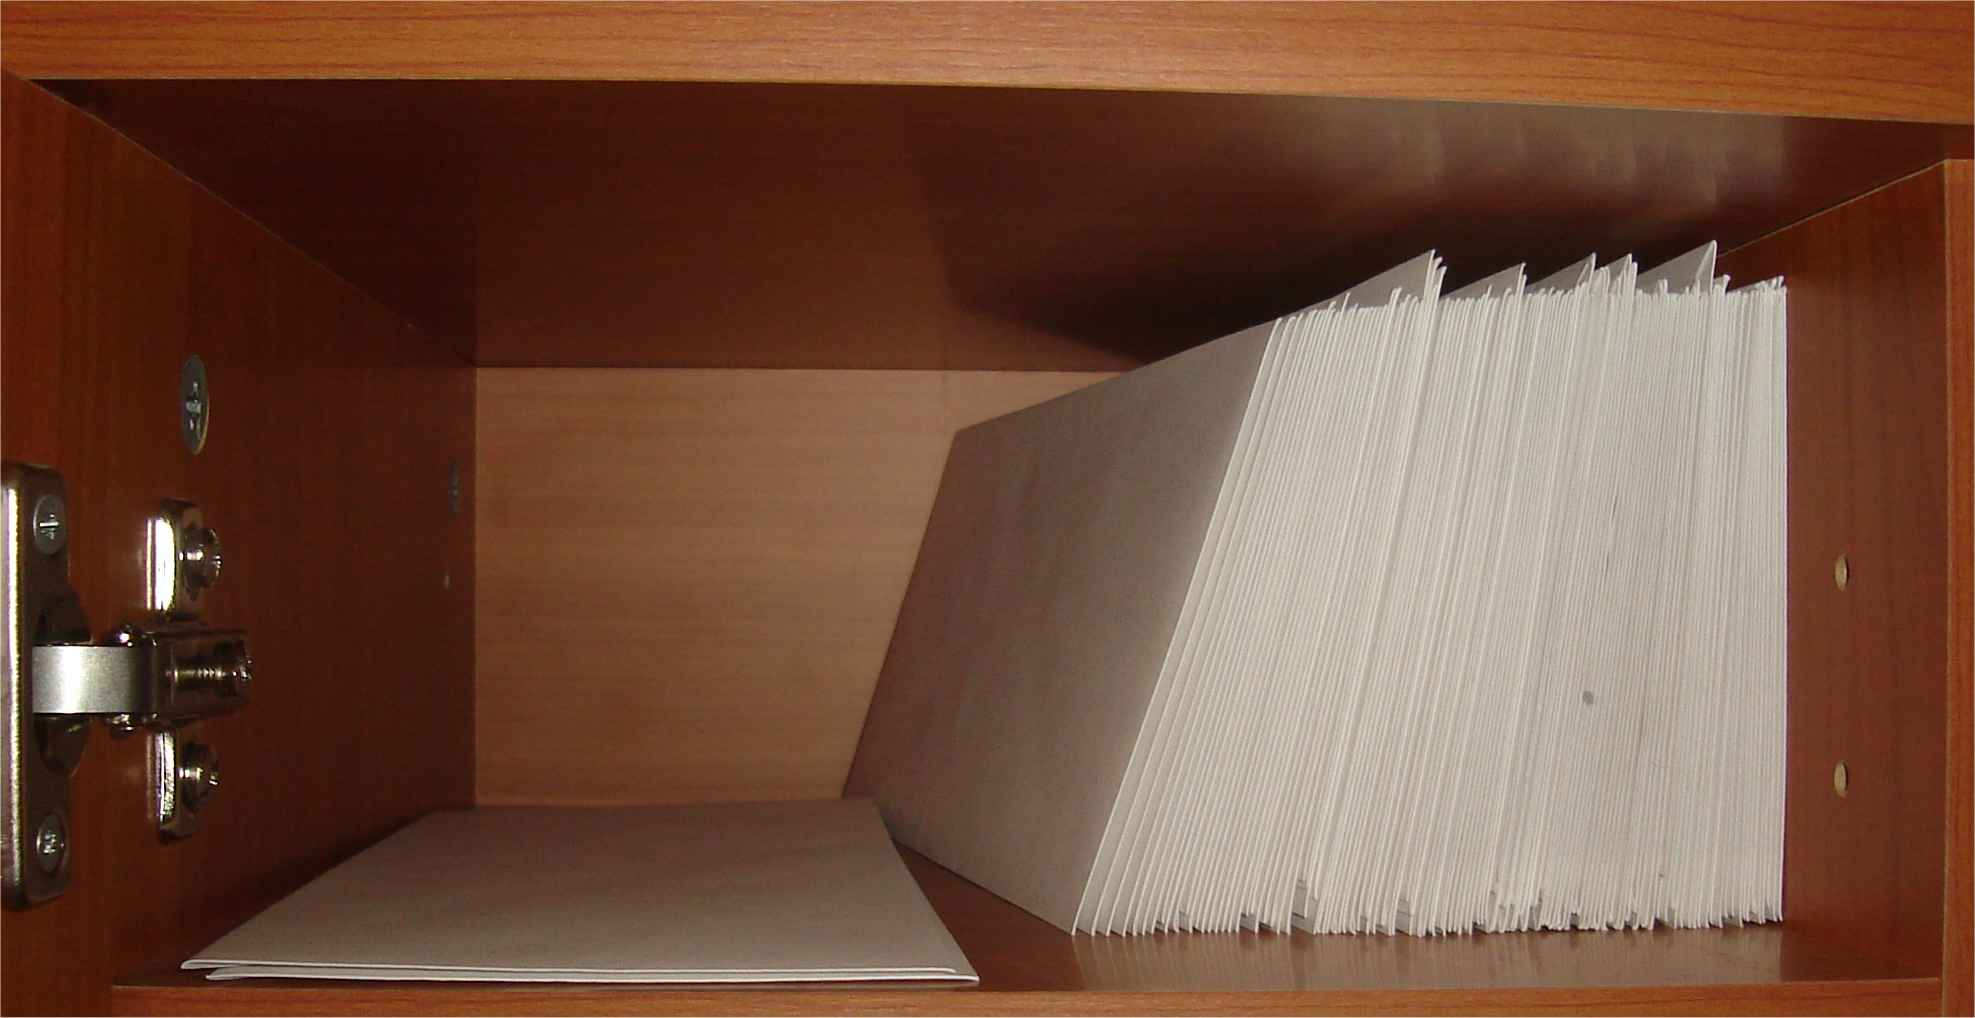 Dale's envelopes